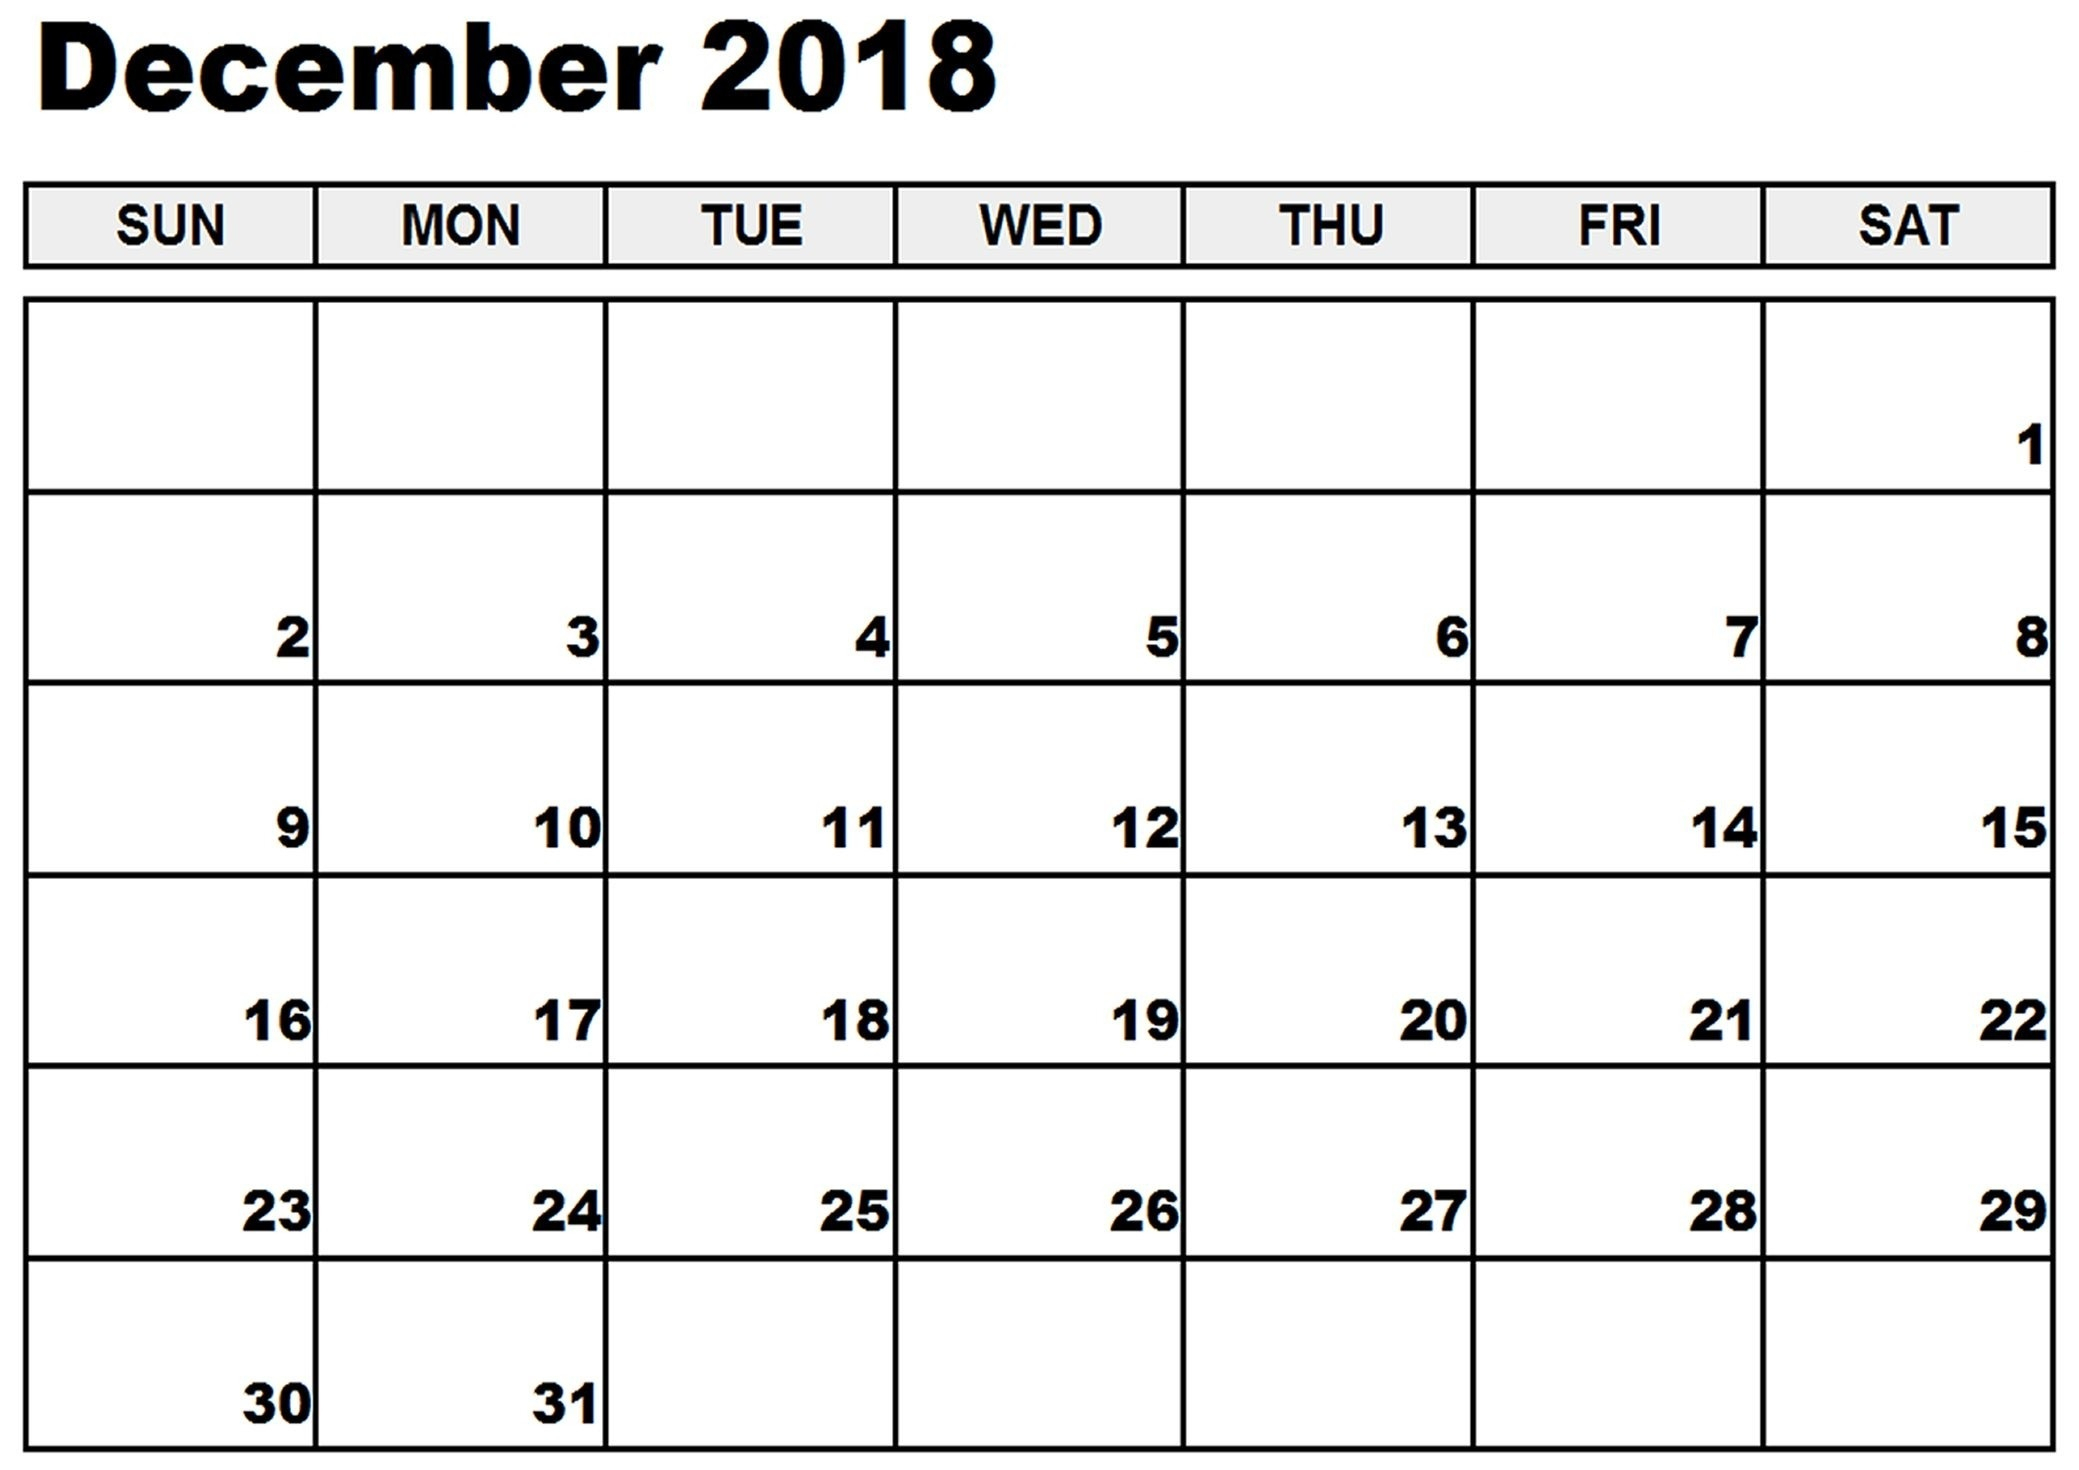 December 2018 Calendar Pdf Printable Template - Printable Calendar for Dec Calendar Printable Template